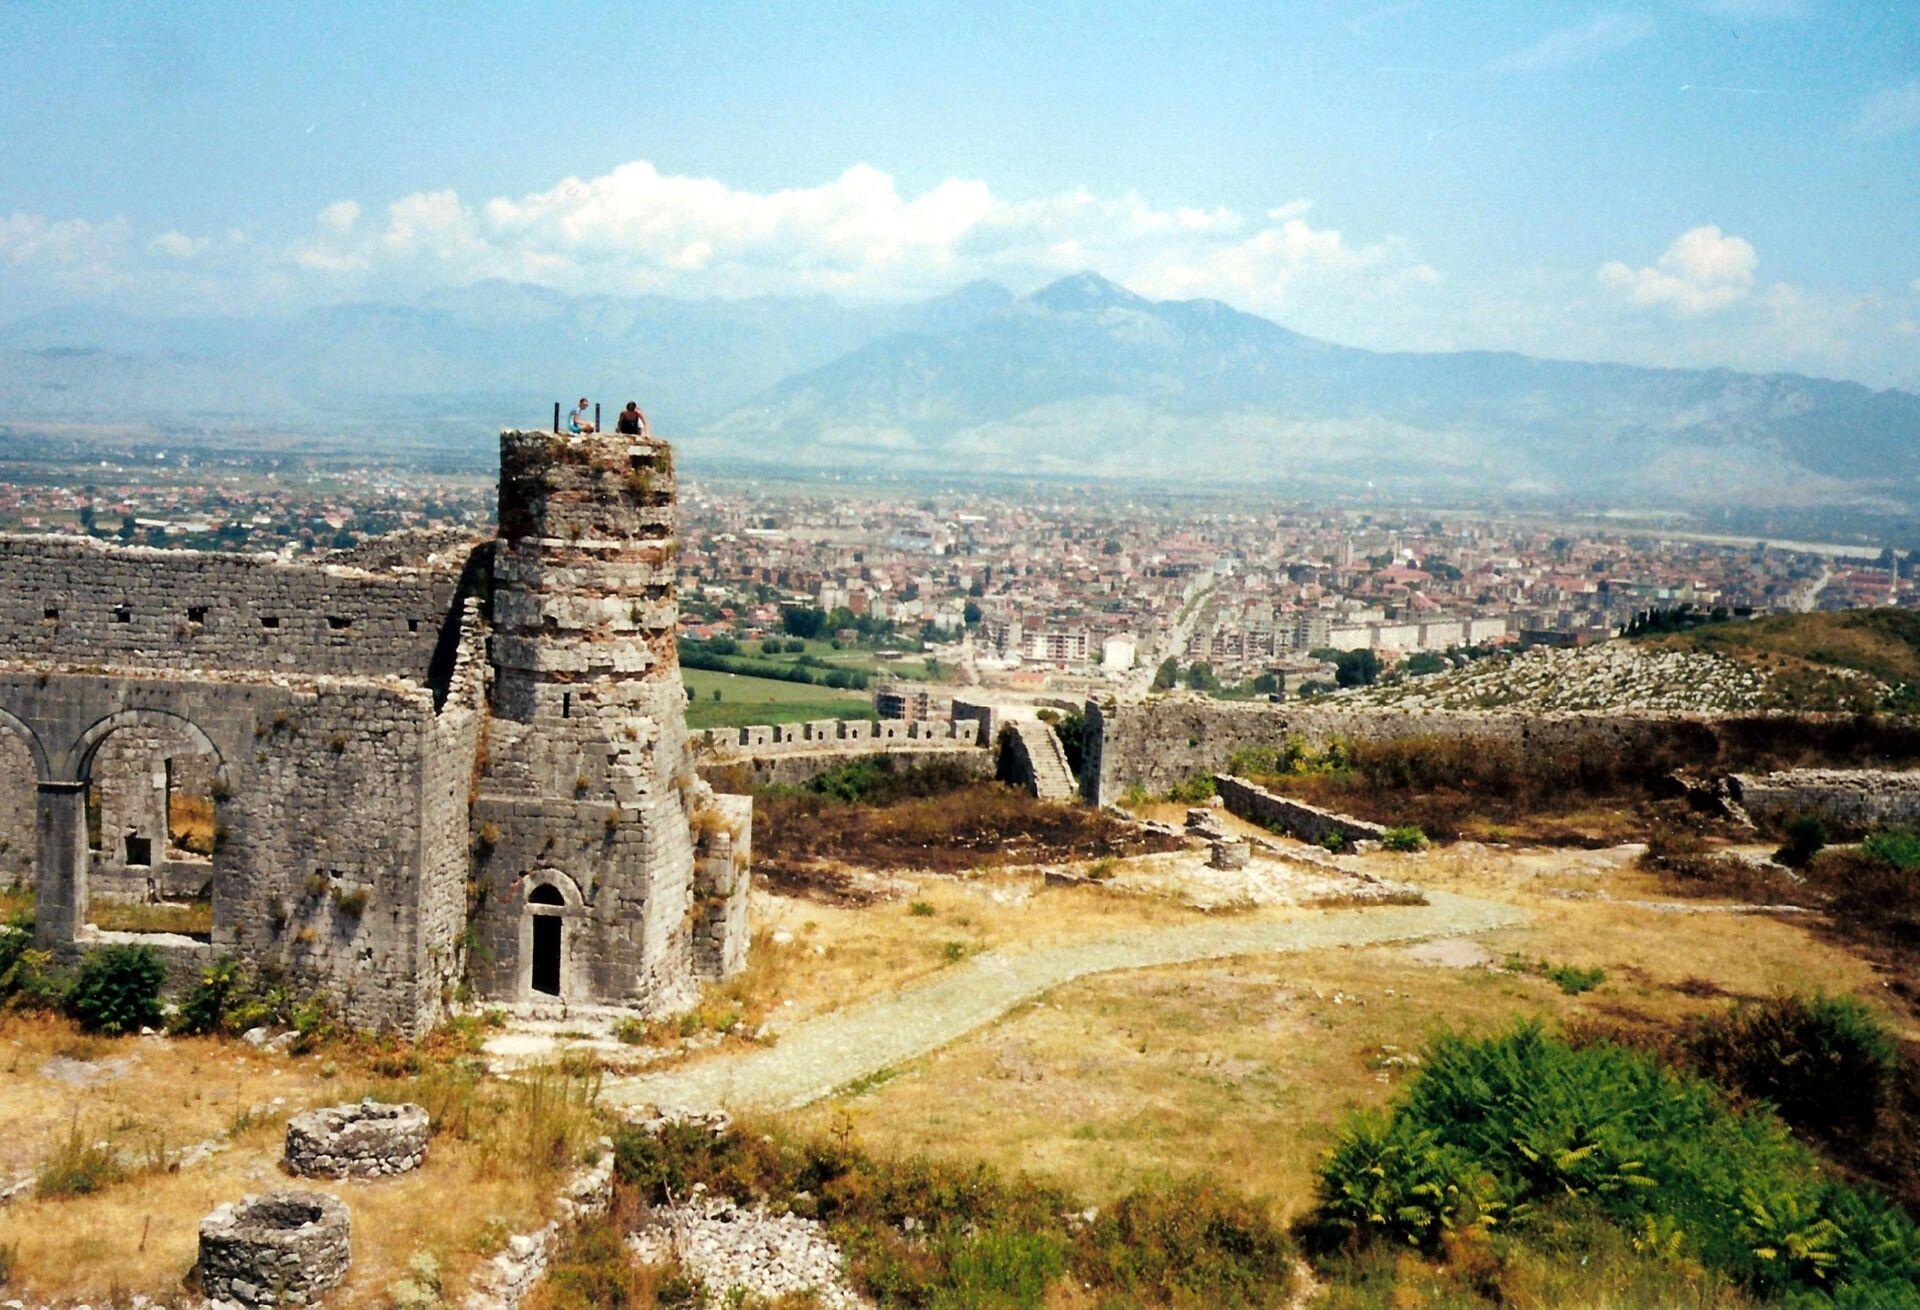 Руины крепости Розафа  - РИА Новости, 1920, 09.06.2021